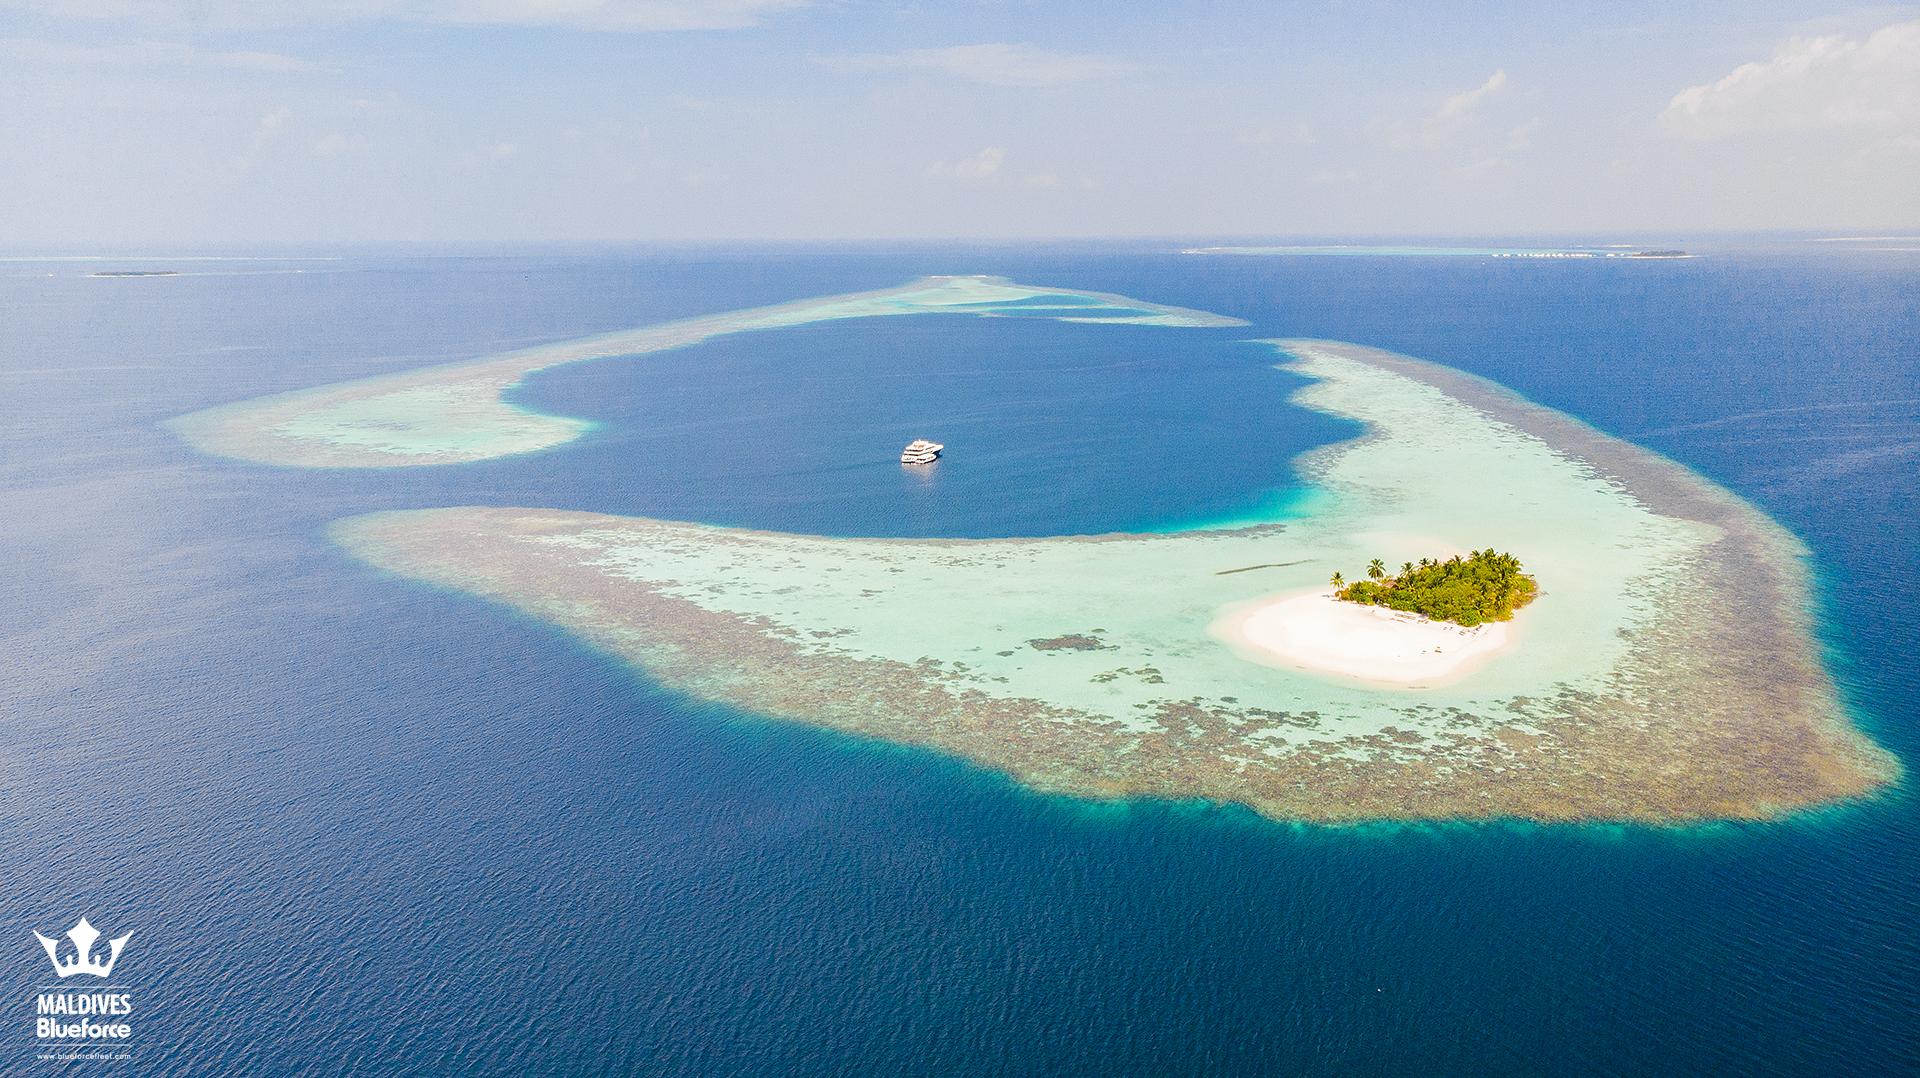 MALDIVES BLUE FORCE ONE HORIZON TEST WEEK